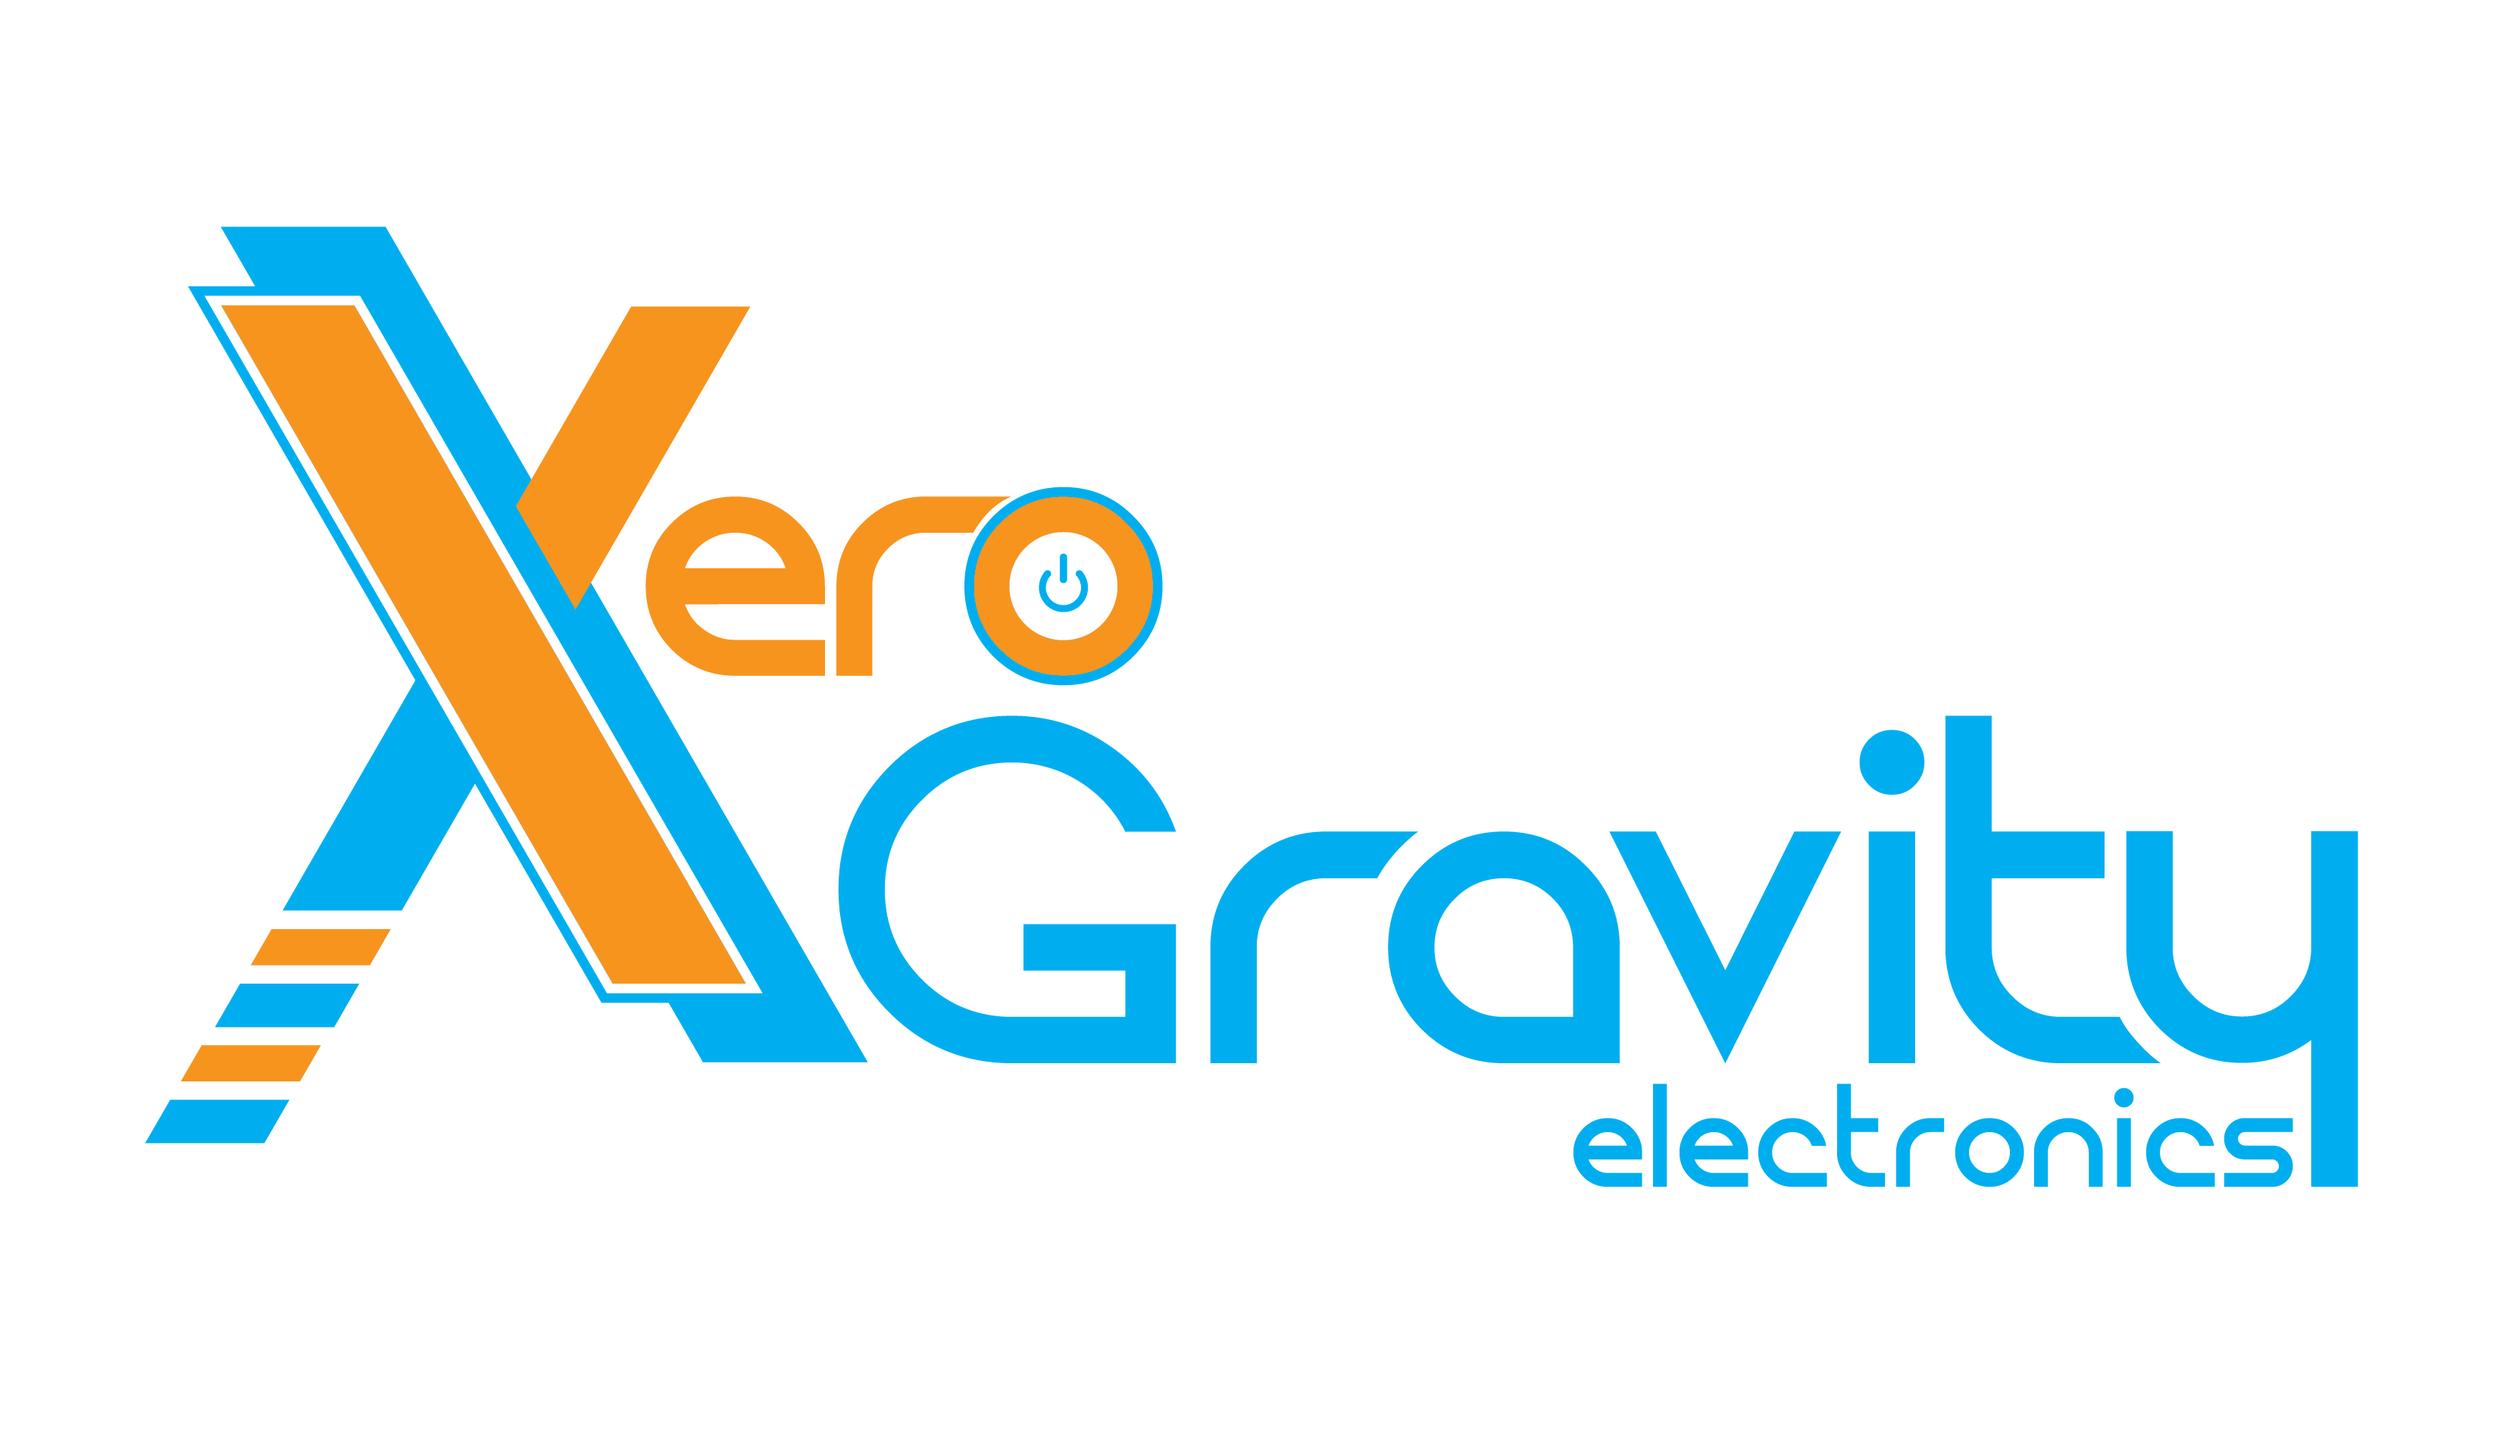 Xero Gravity Electronics (BRAND).png